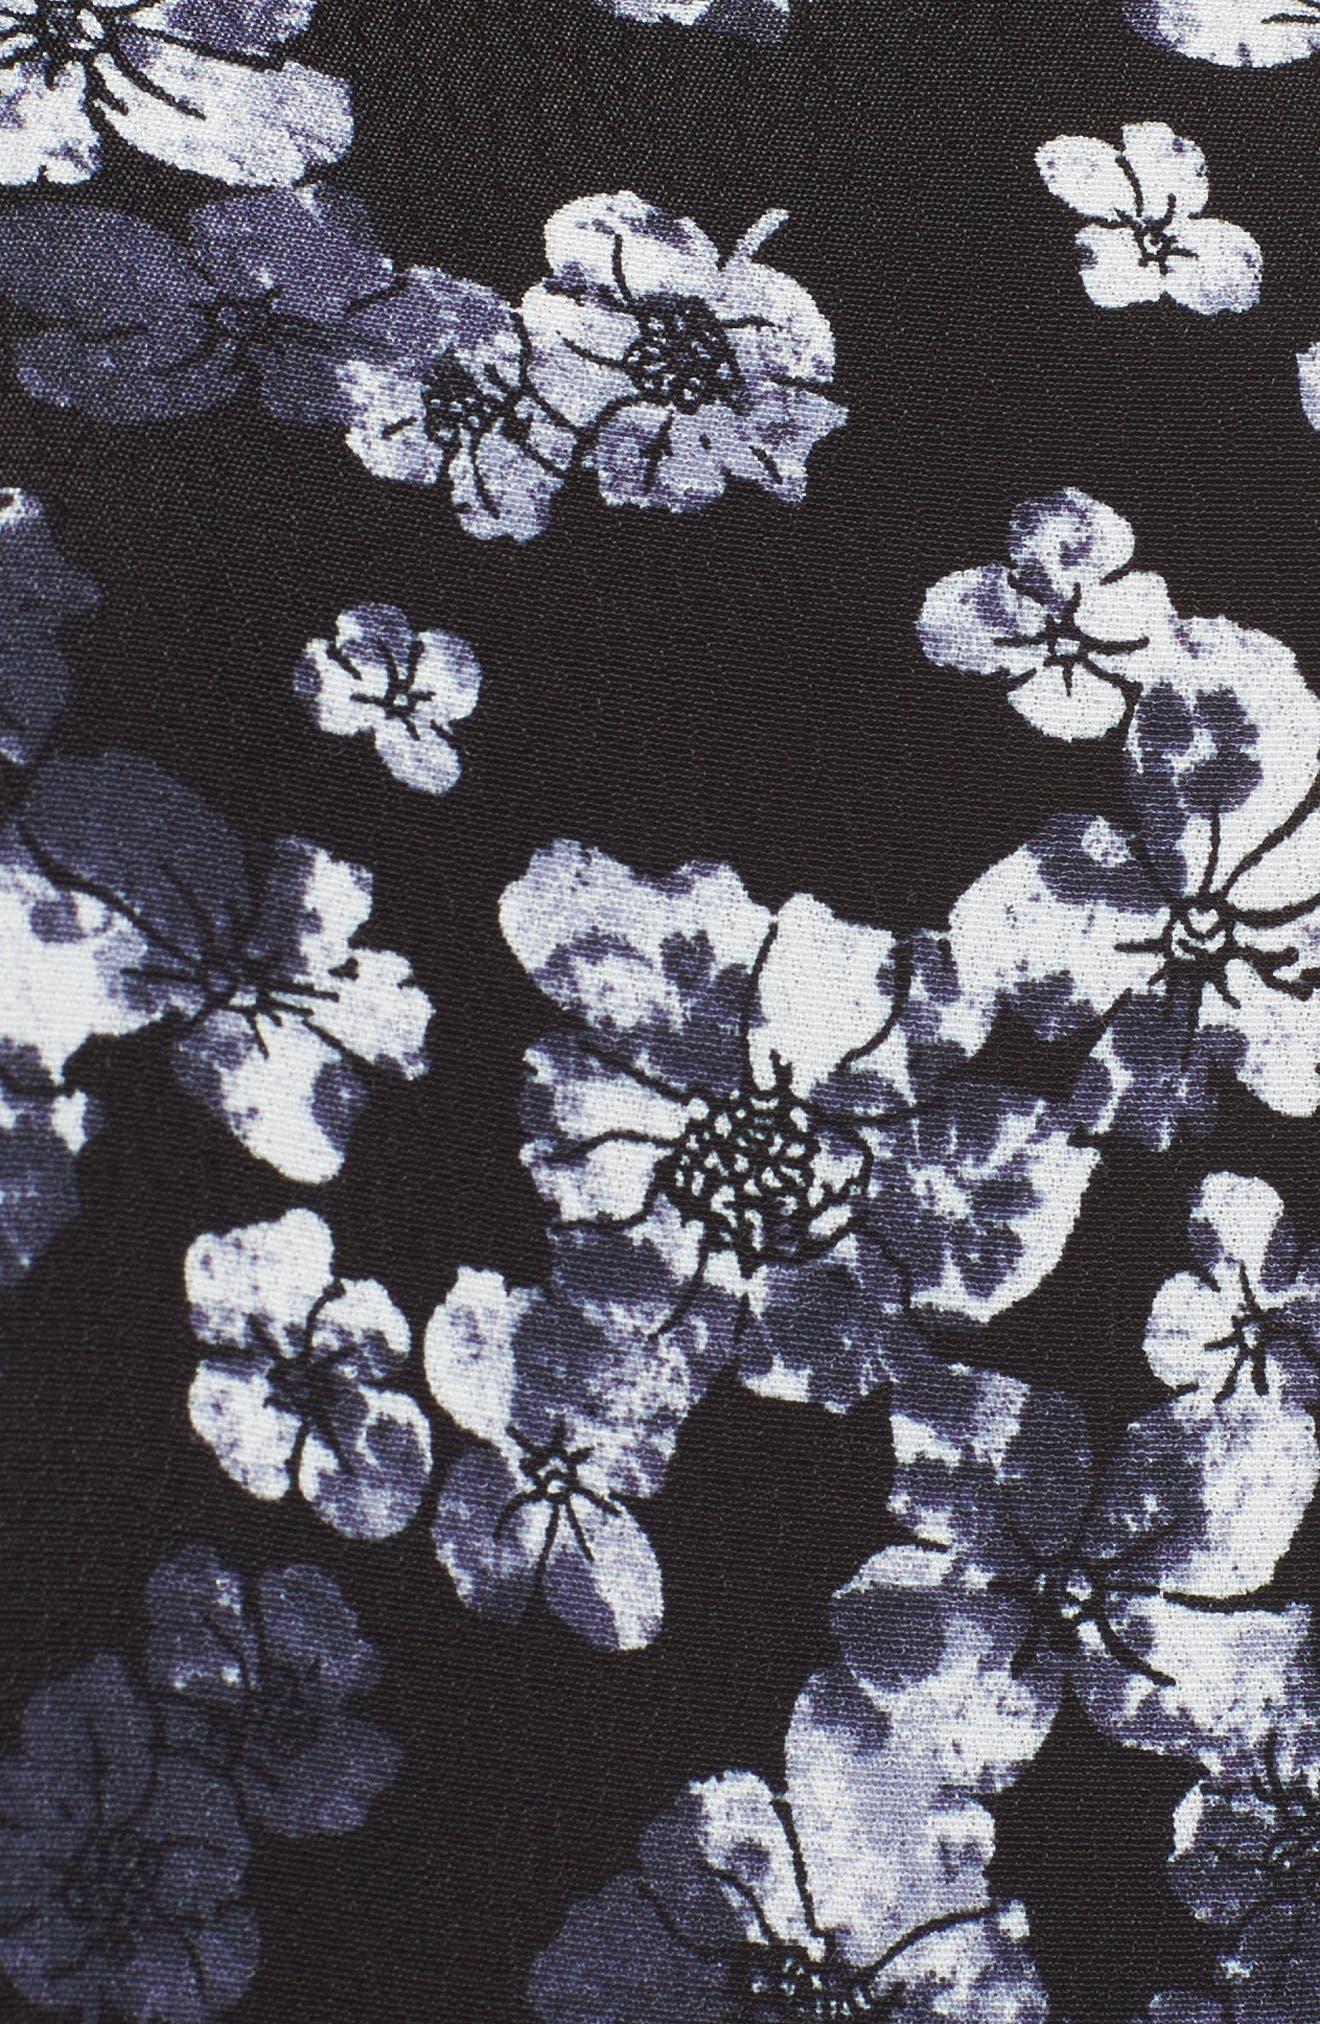 V-Neck Peplum Top,                             Alternate thumbnail 5, color,                             Black- Ivory Holiday Floral